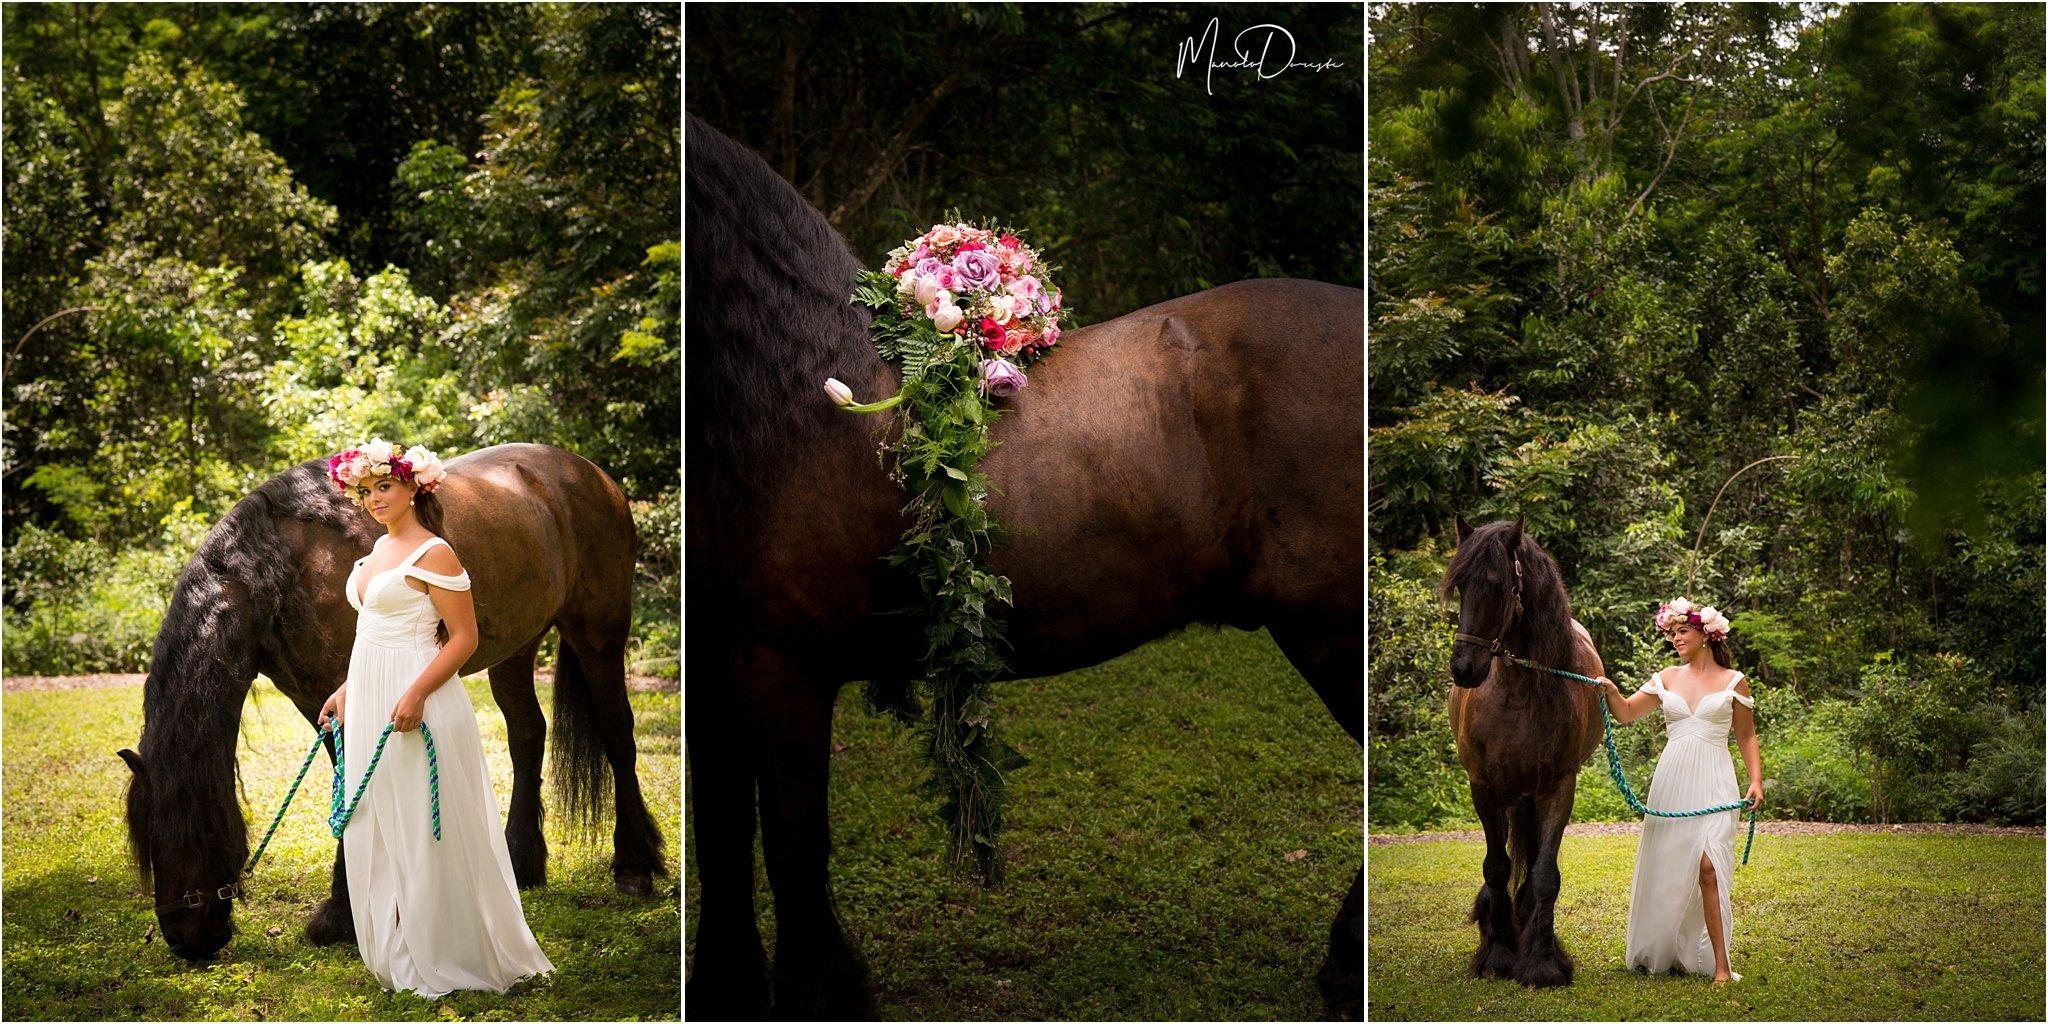 0338_ManoloDoreste_InFocusStudios_Wedding_Family_Photography_Miami_MiamiPhotographer.jpg